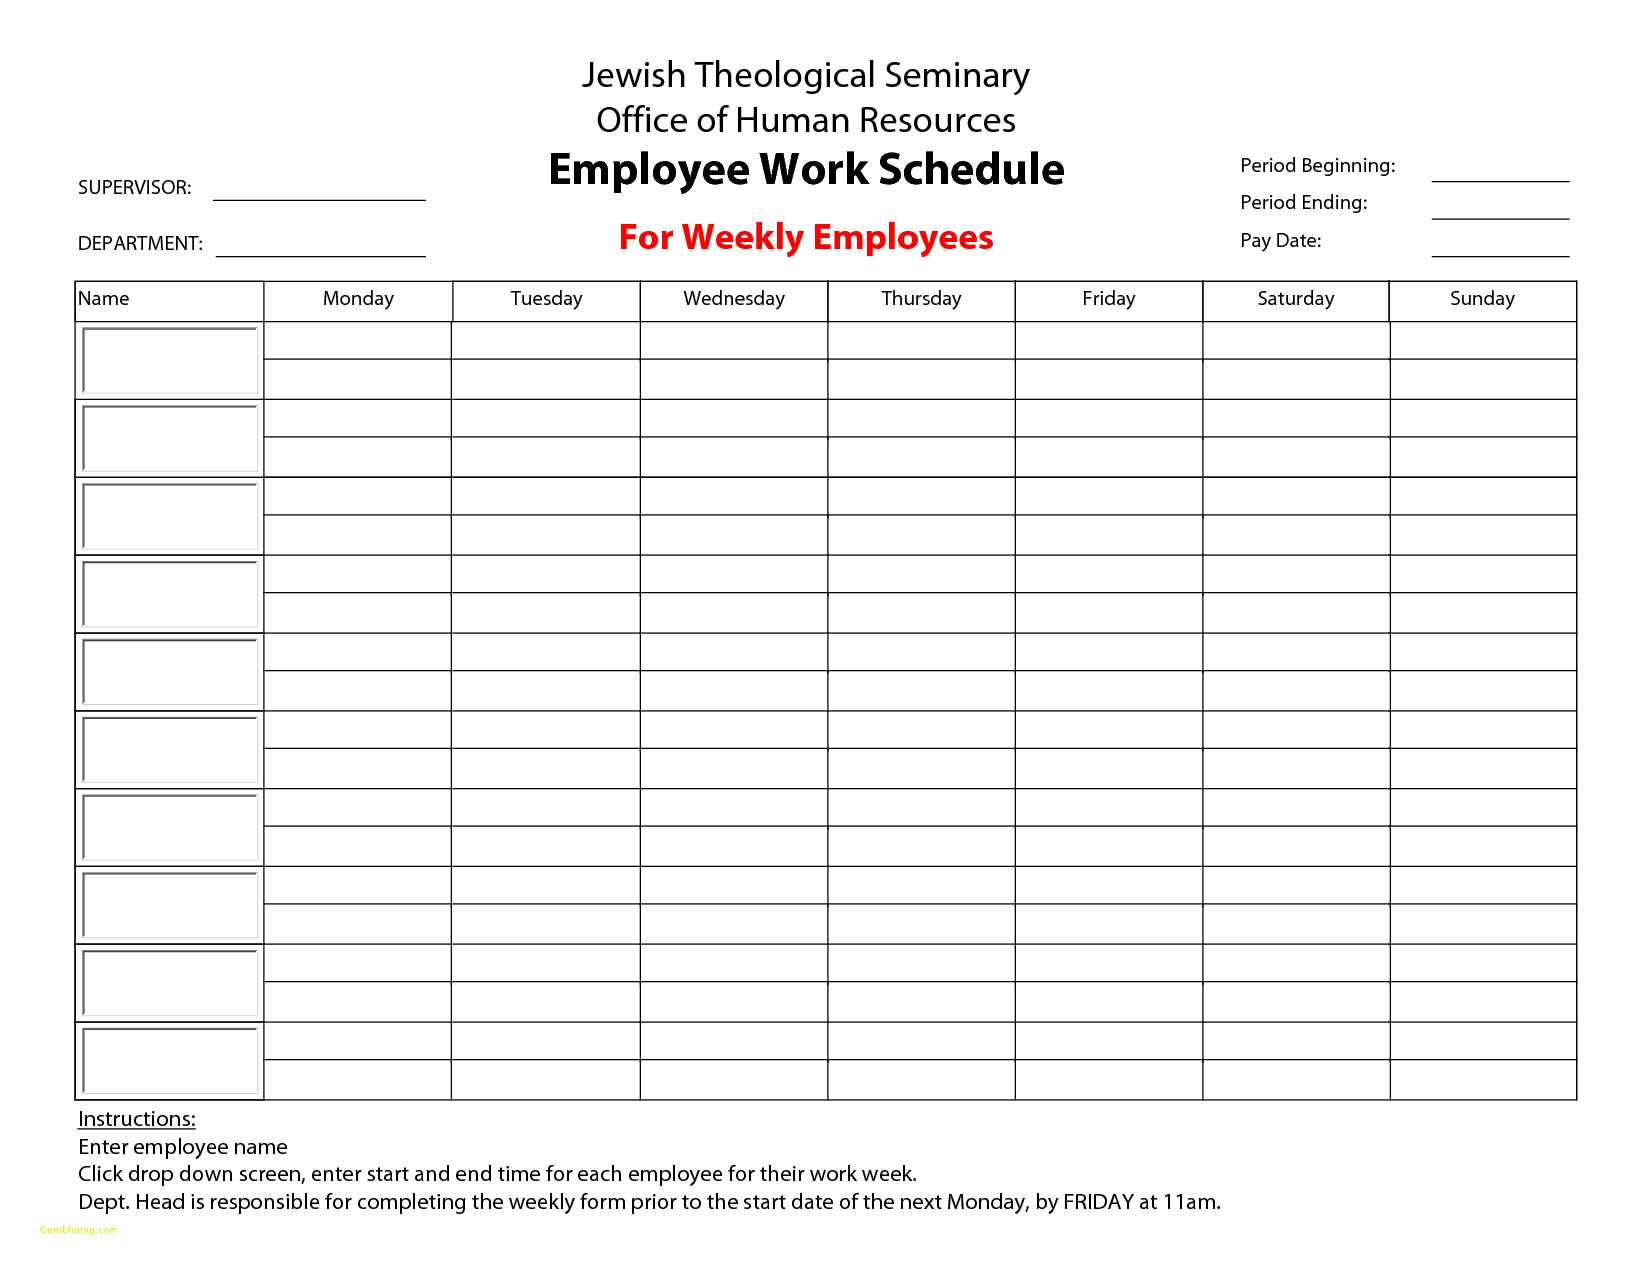 Resource Scheduling Spreadsheet   Awal Mula Inside Employee Schedule Spreadsheet